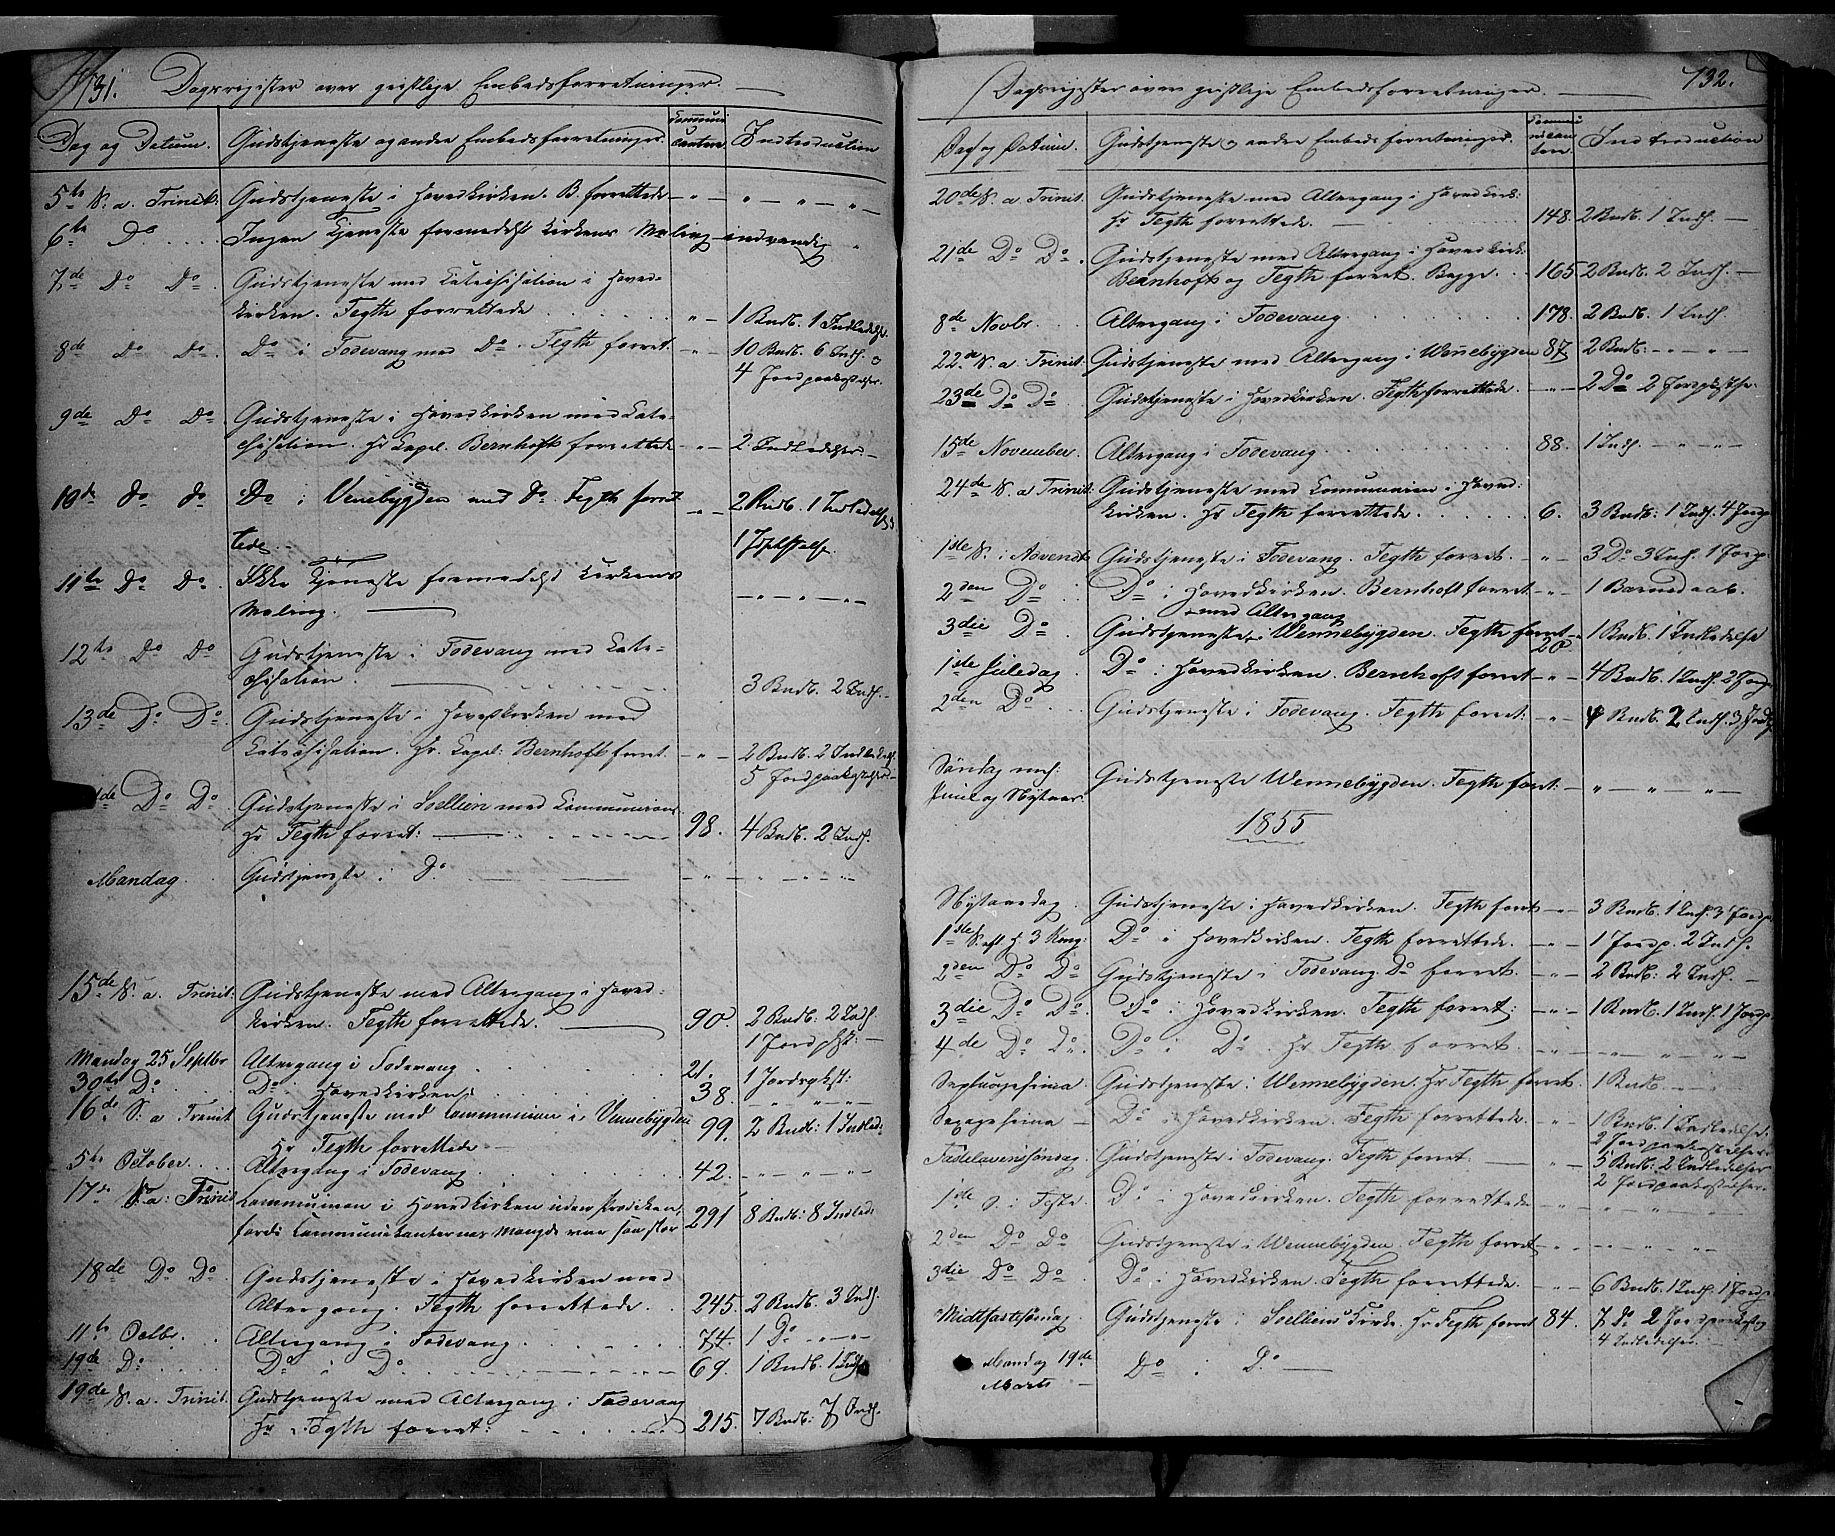 SAH, Ringebu prestekontor, Ministerialbok nr. 6, 1848-1859, s. 731-732